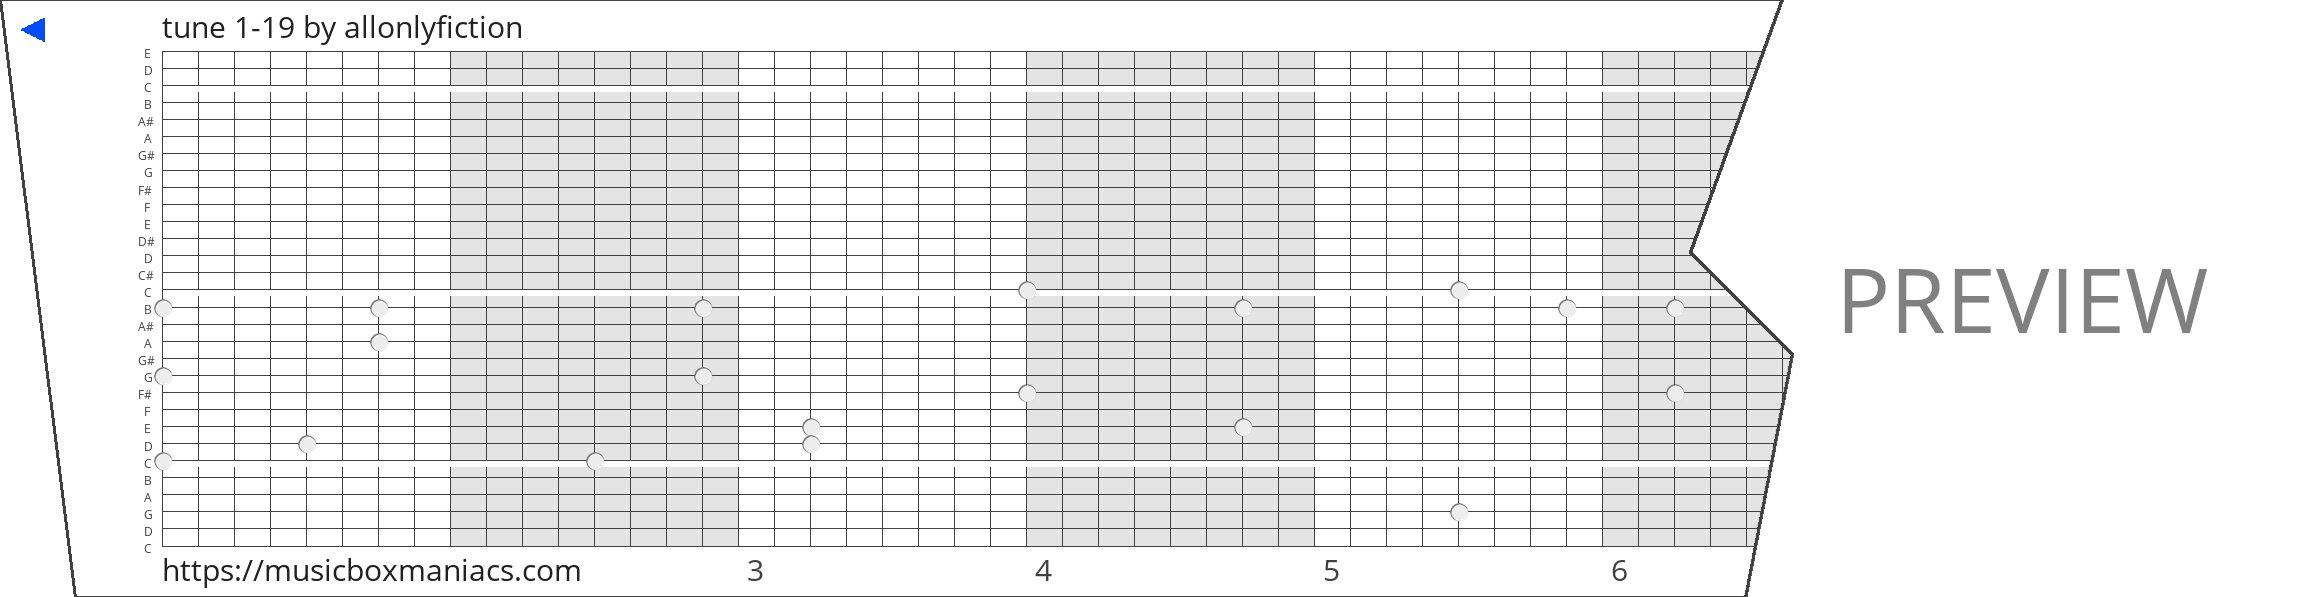 tune 1-19 30 note music box paper strip